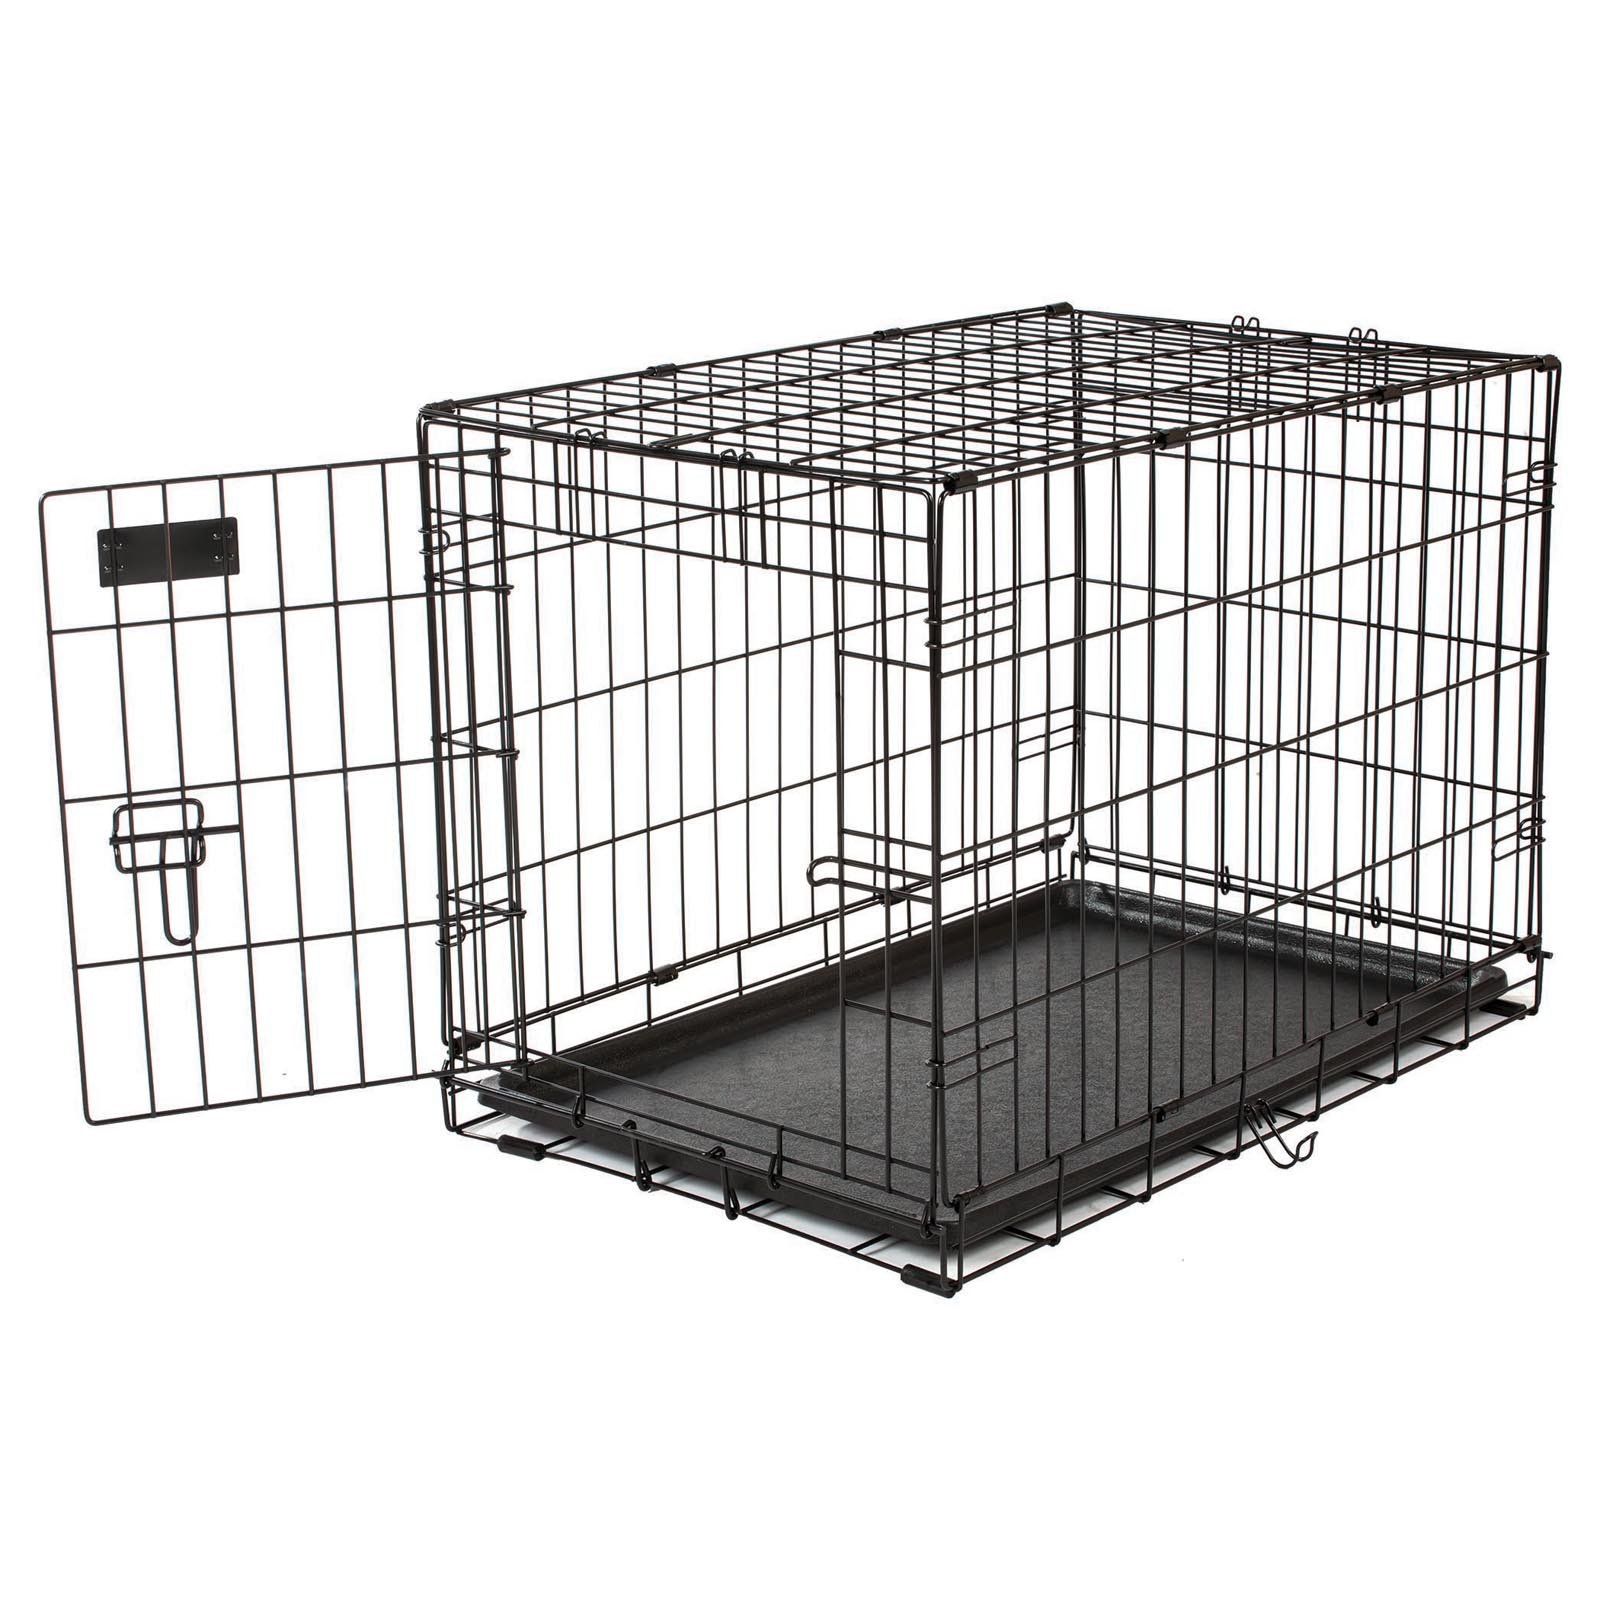 Precision Pet Care Single Door Dog Crate - X-Small - Walmart.com